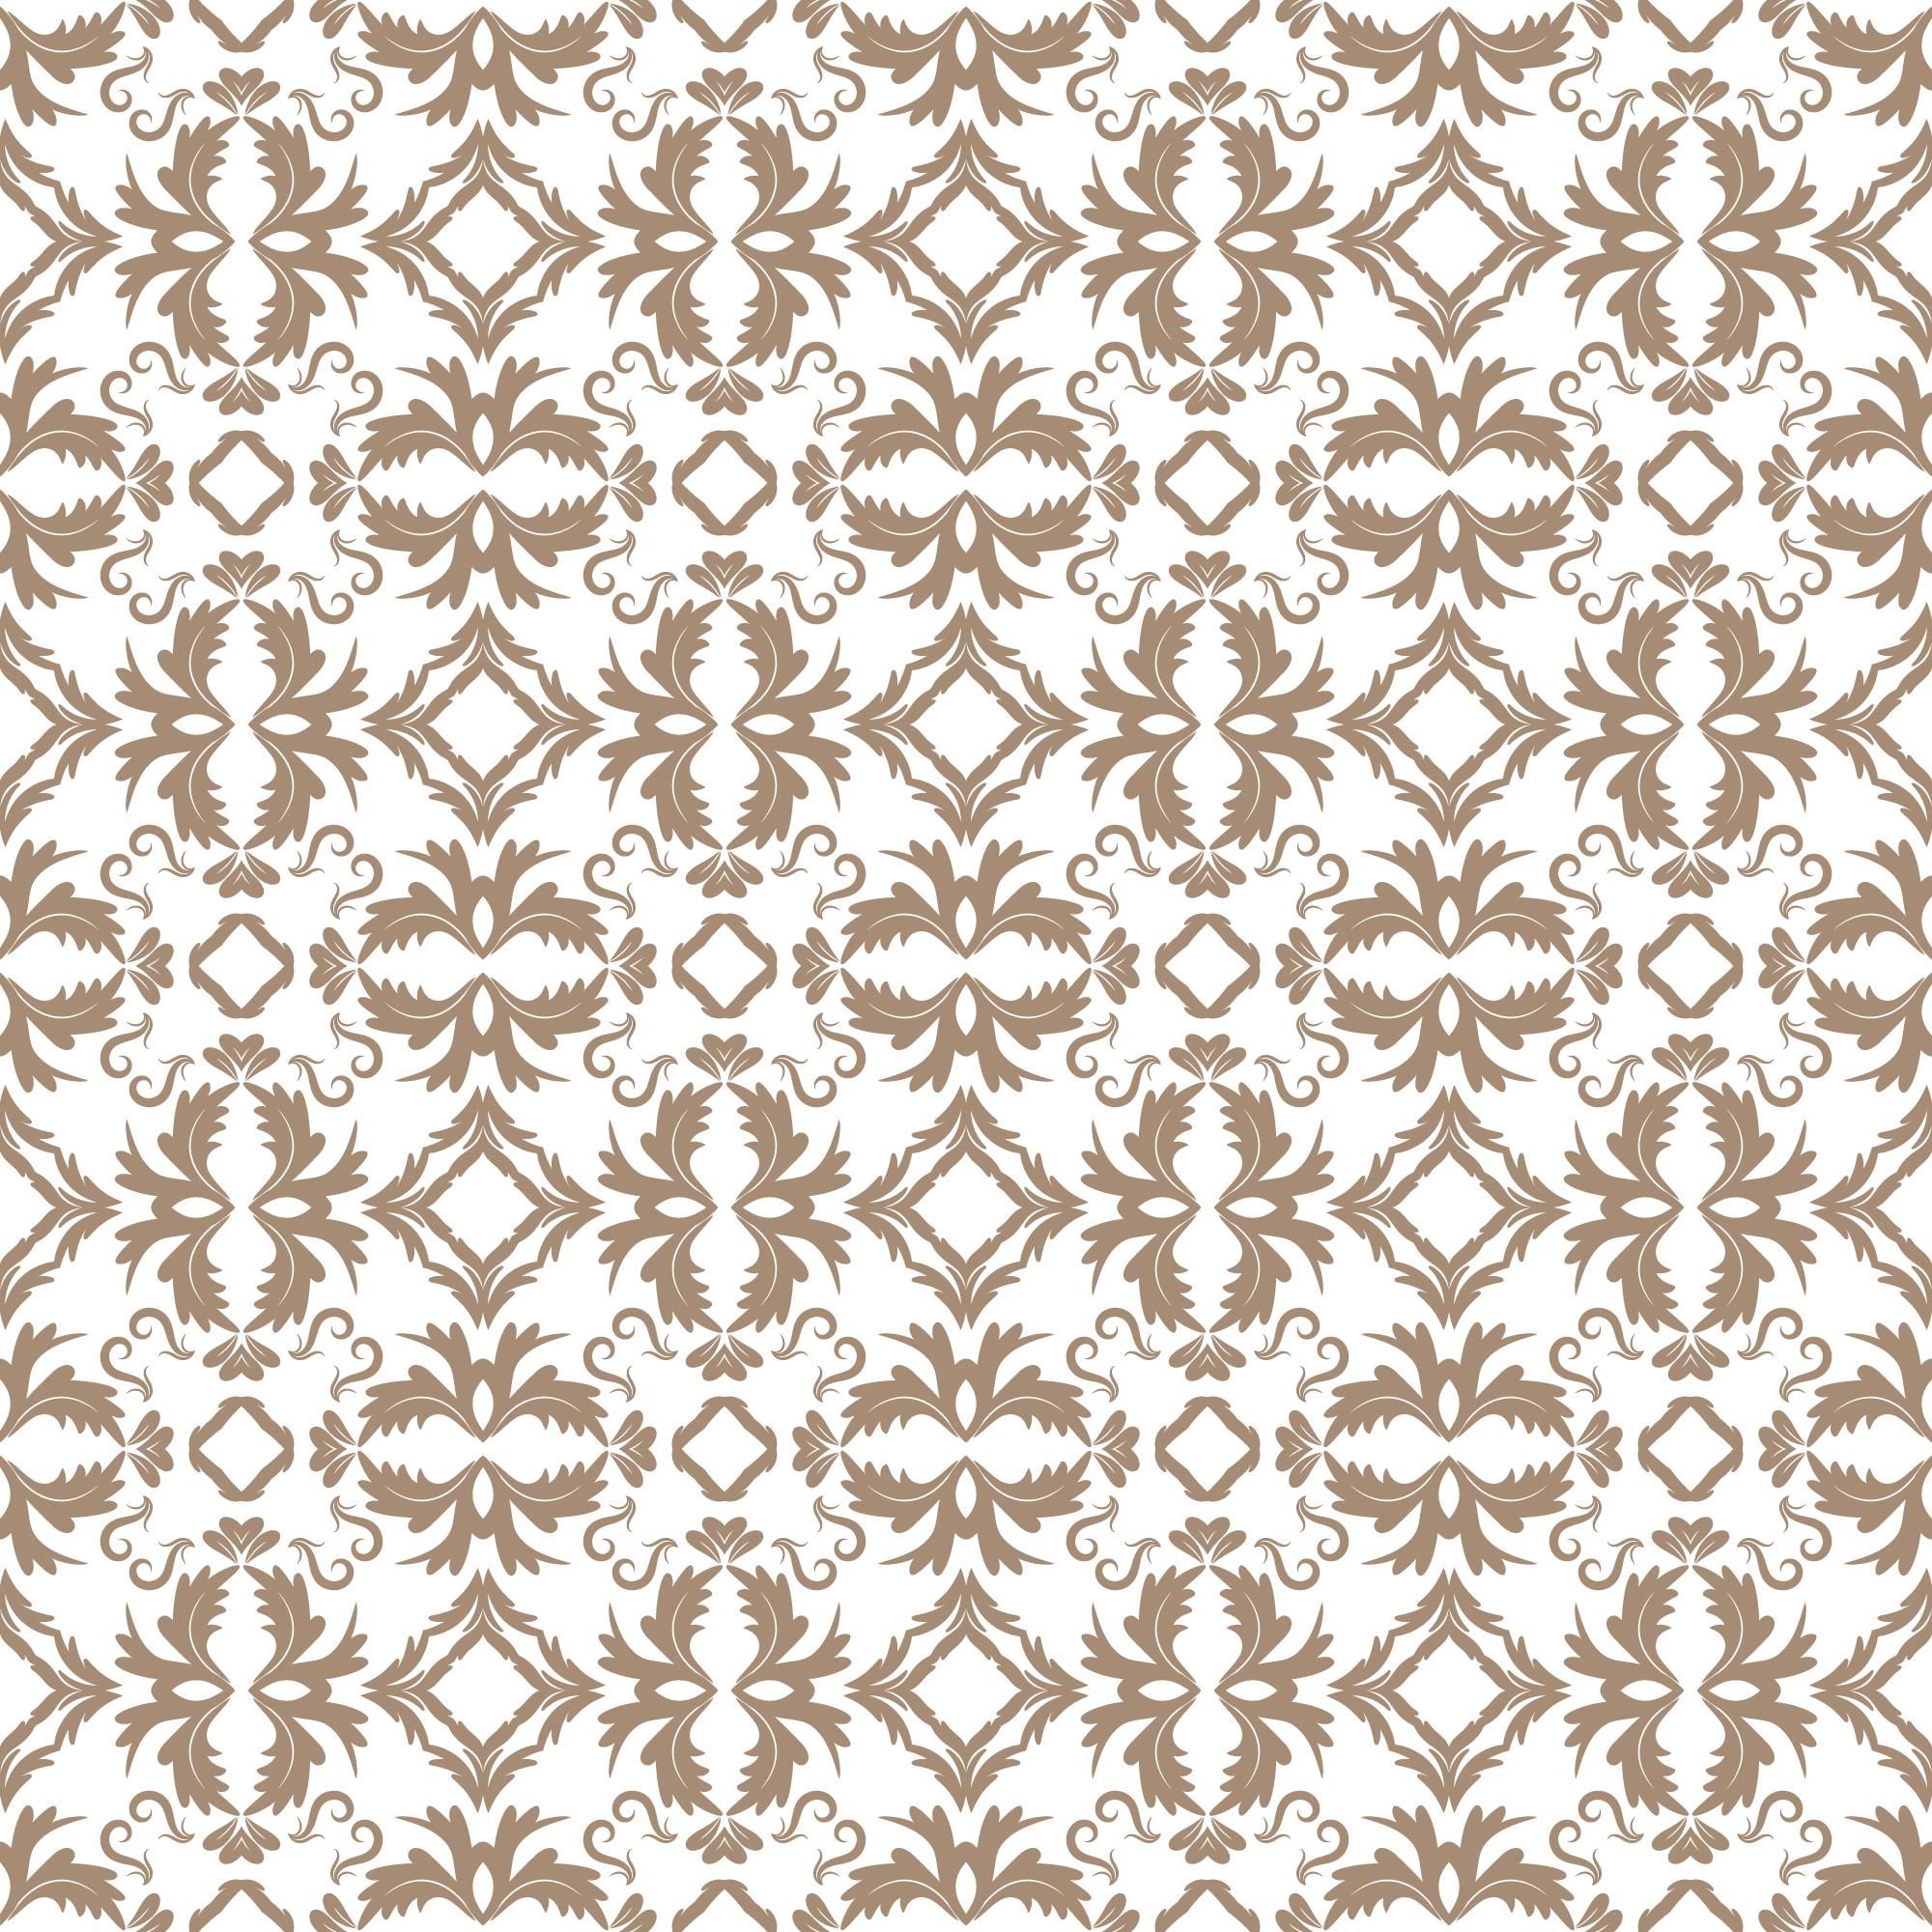 Floral pattern  Wallpaper baroque, damask  Seamless vector